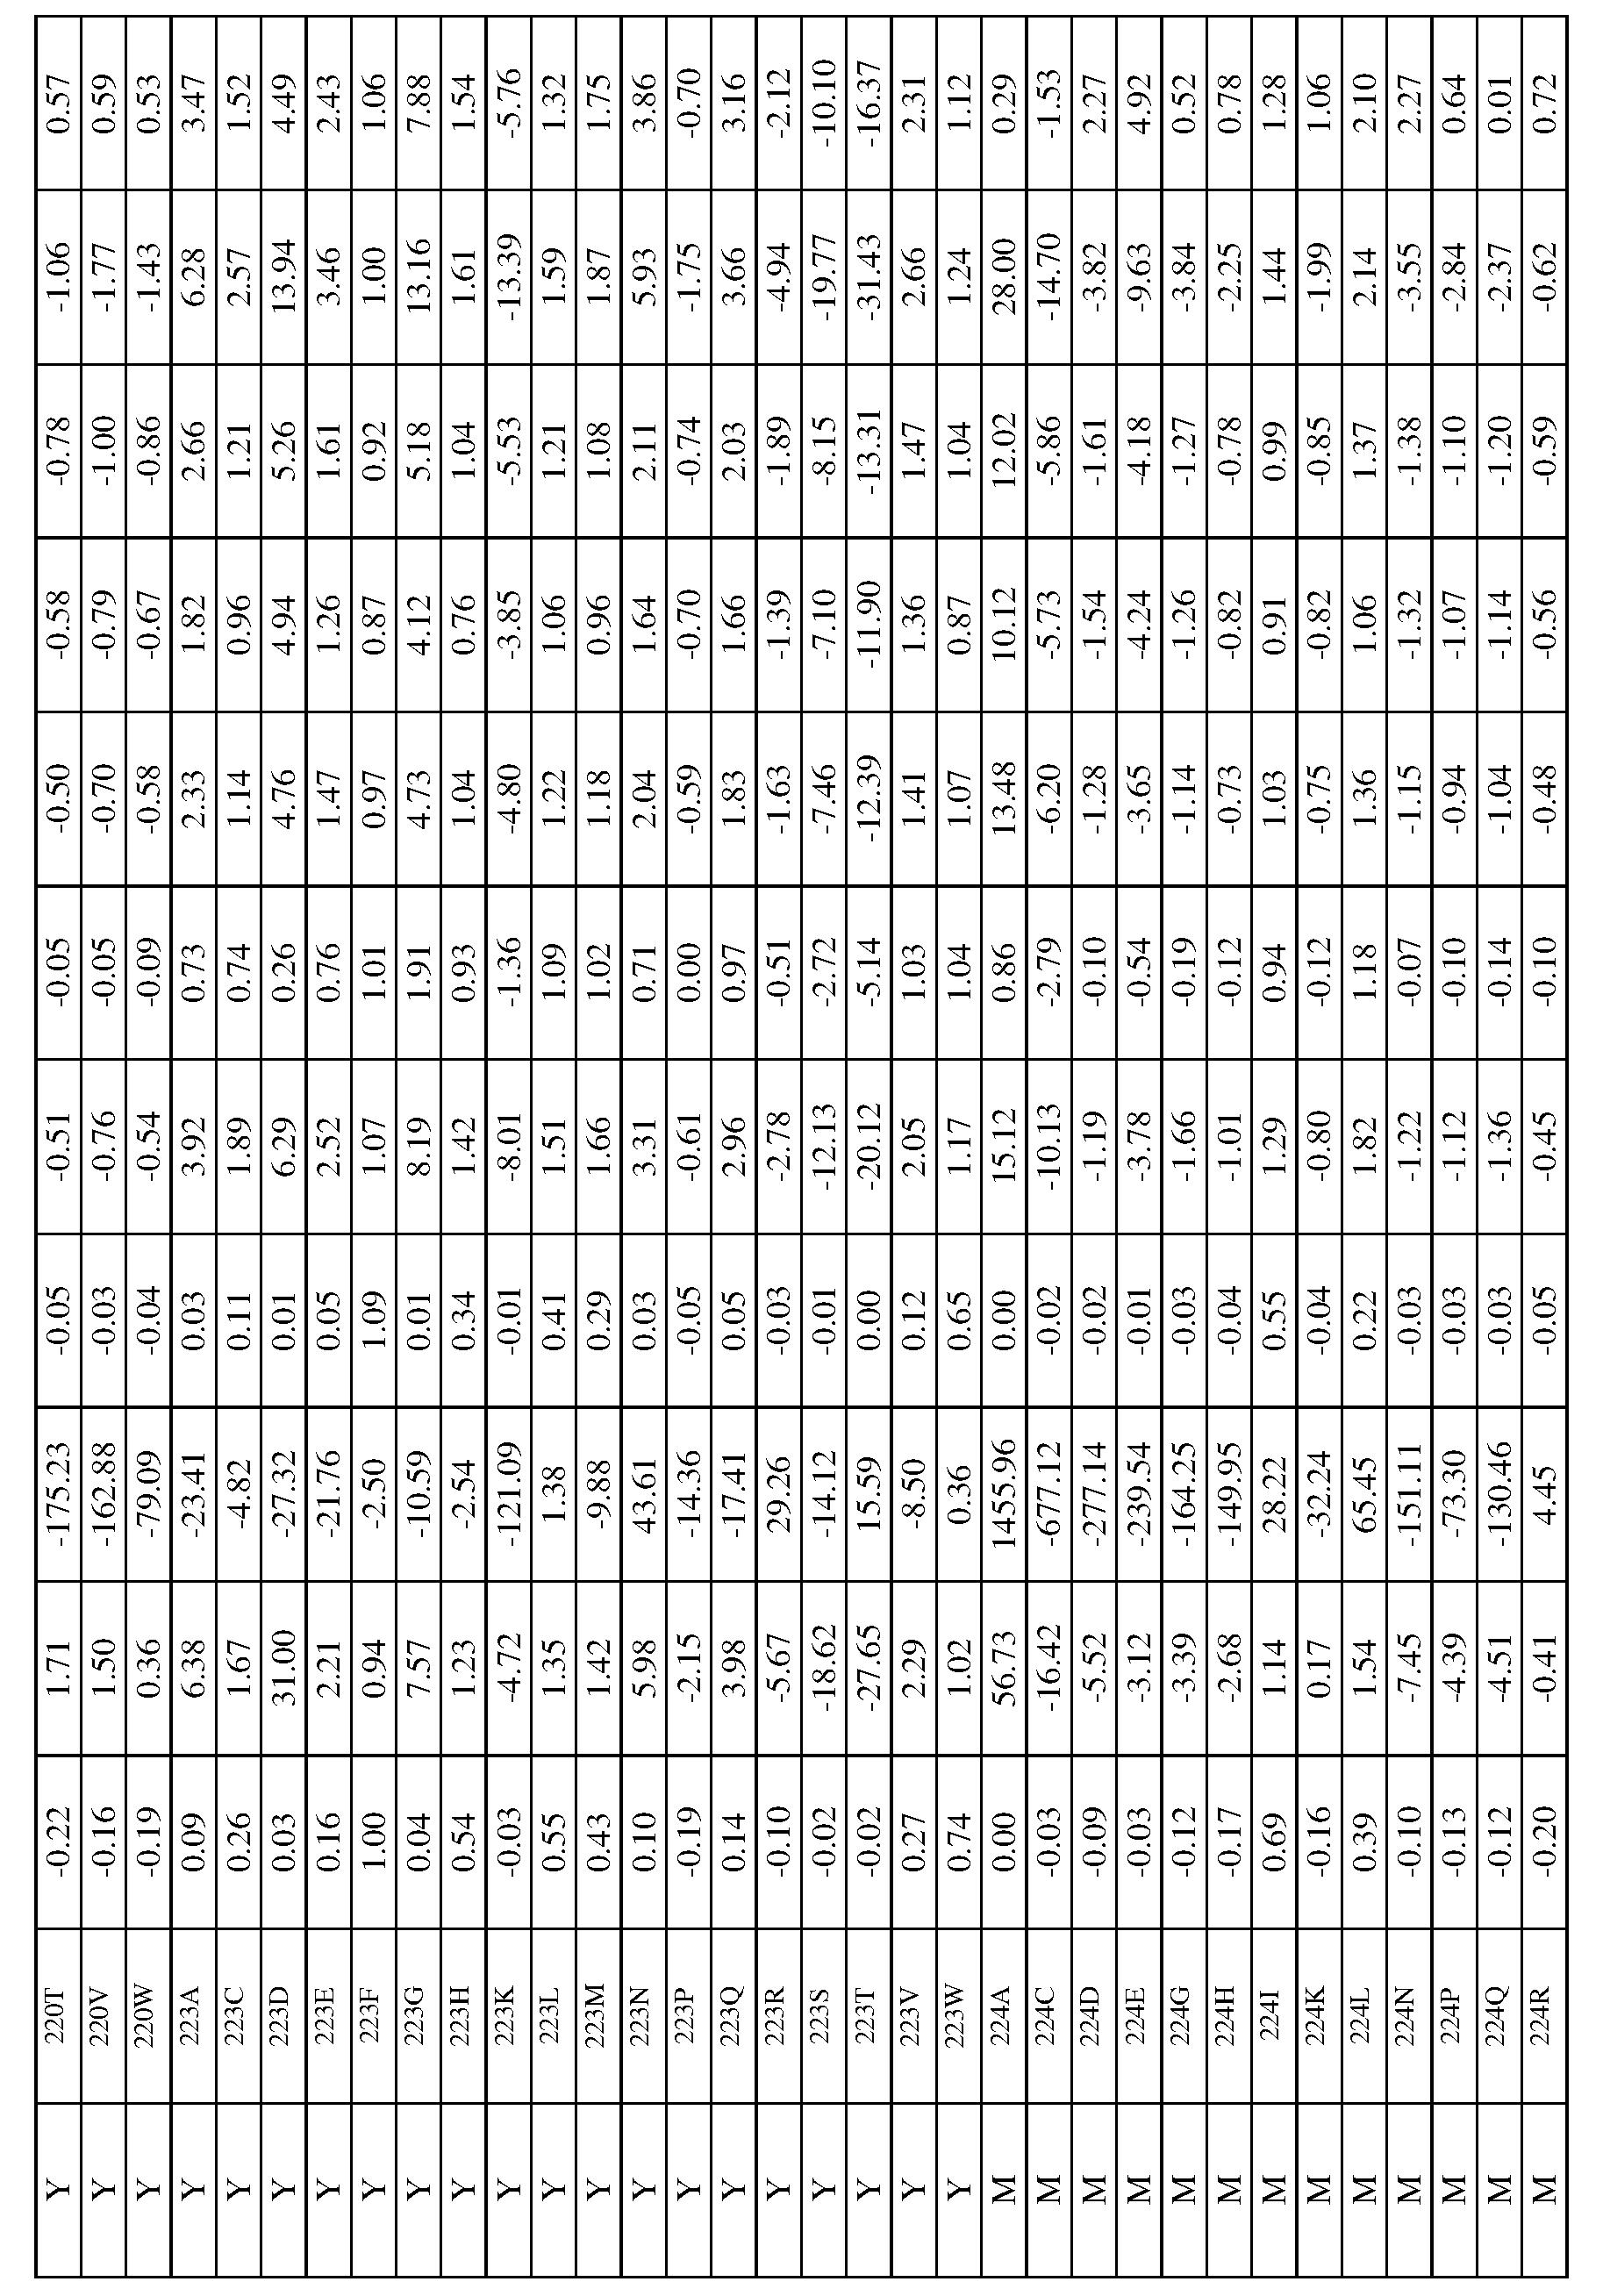 R6004325-M Berisford Razzle Ribbon LL per 3 metres